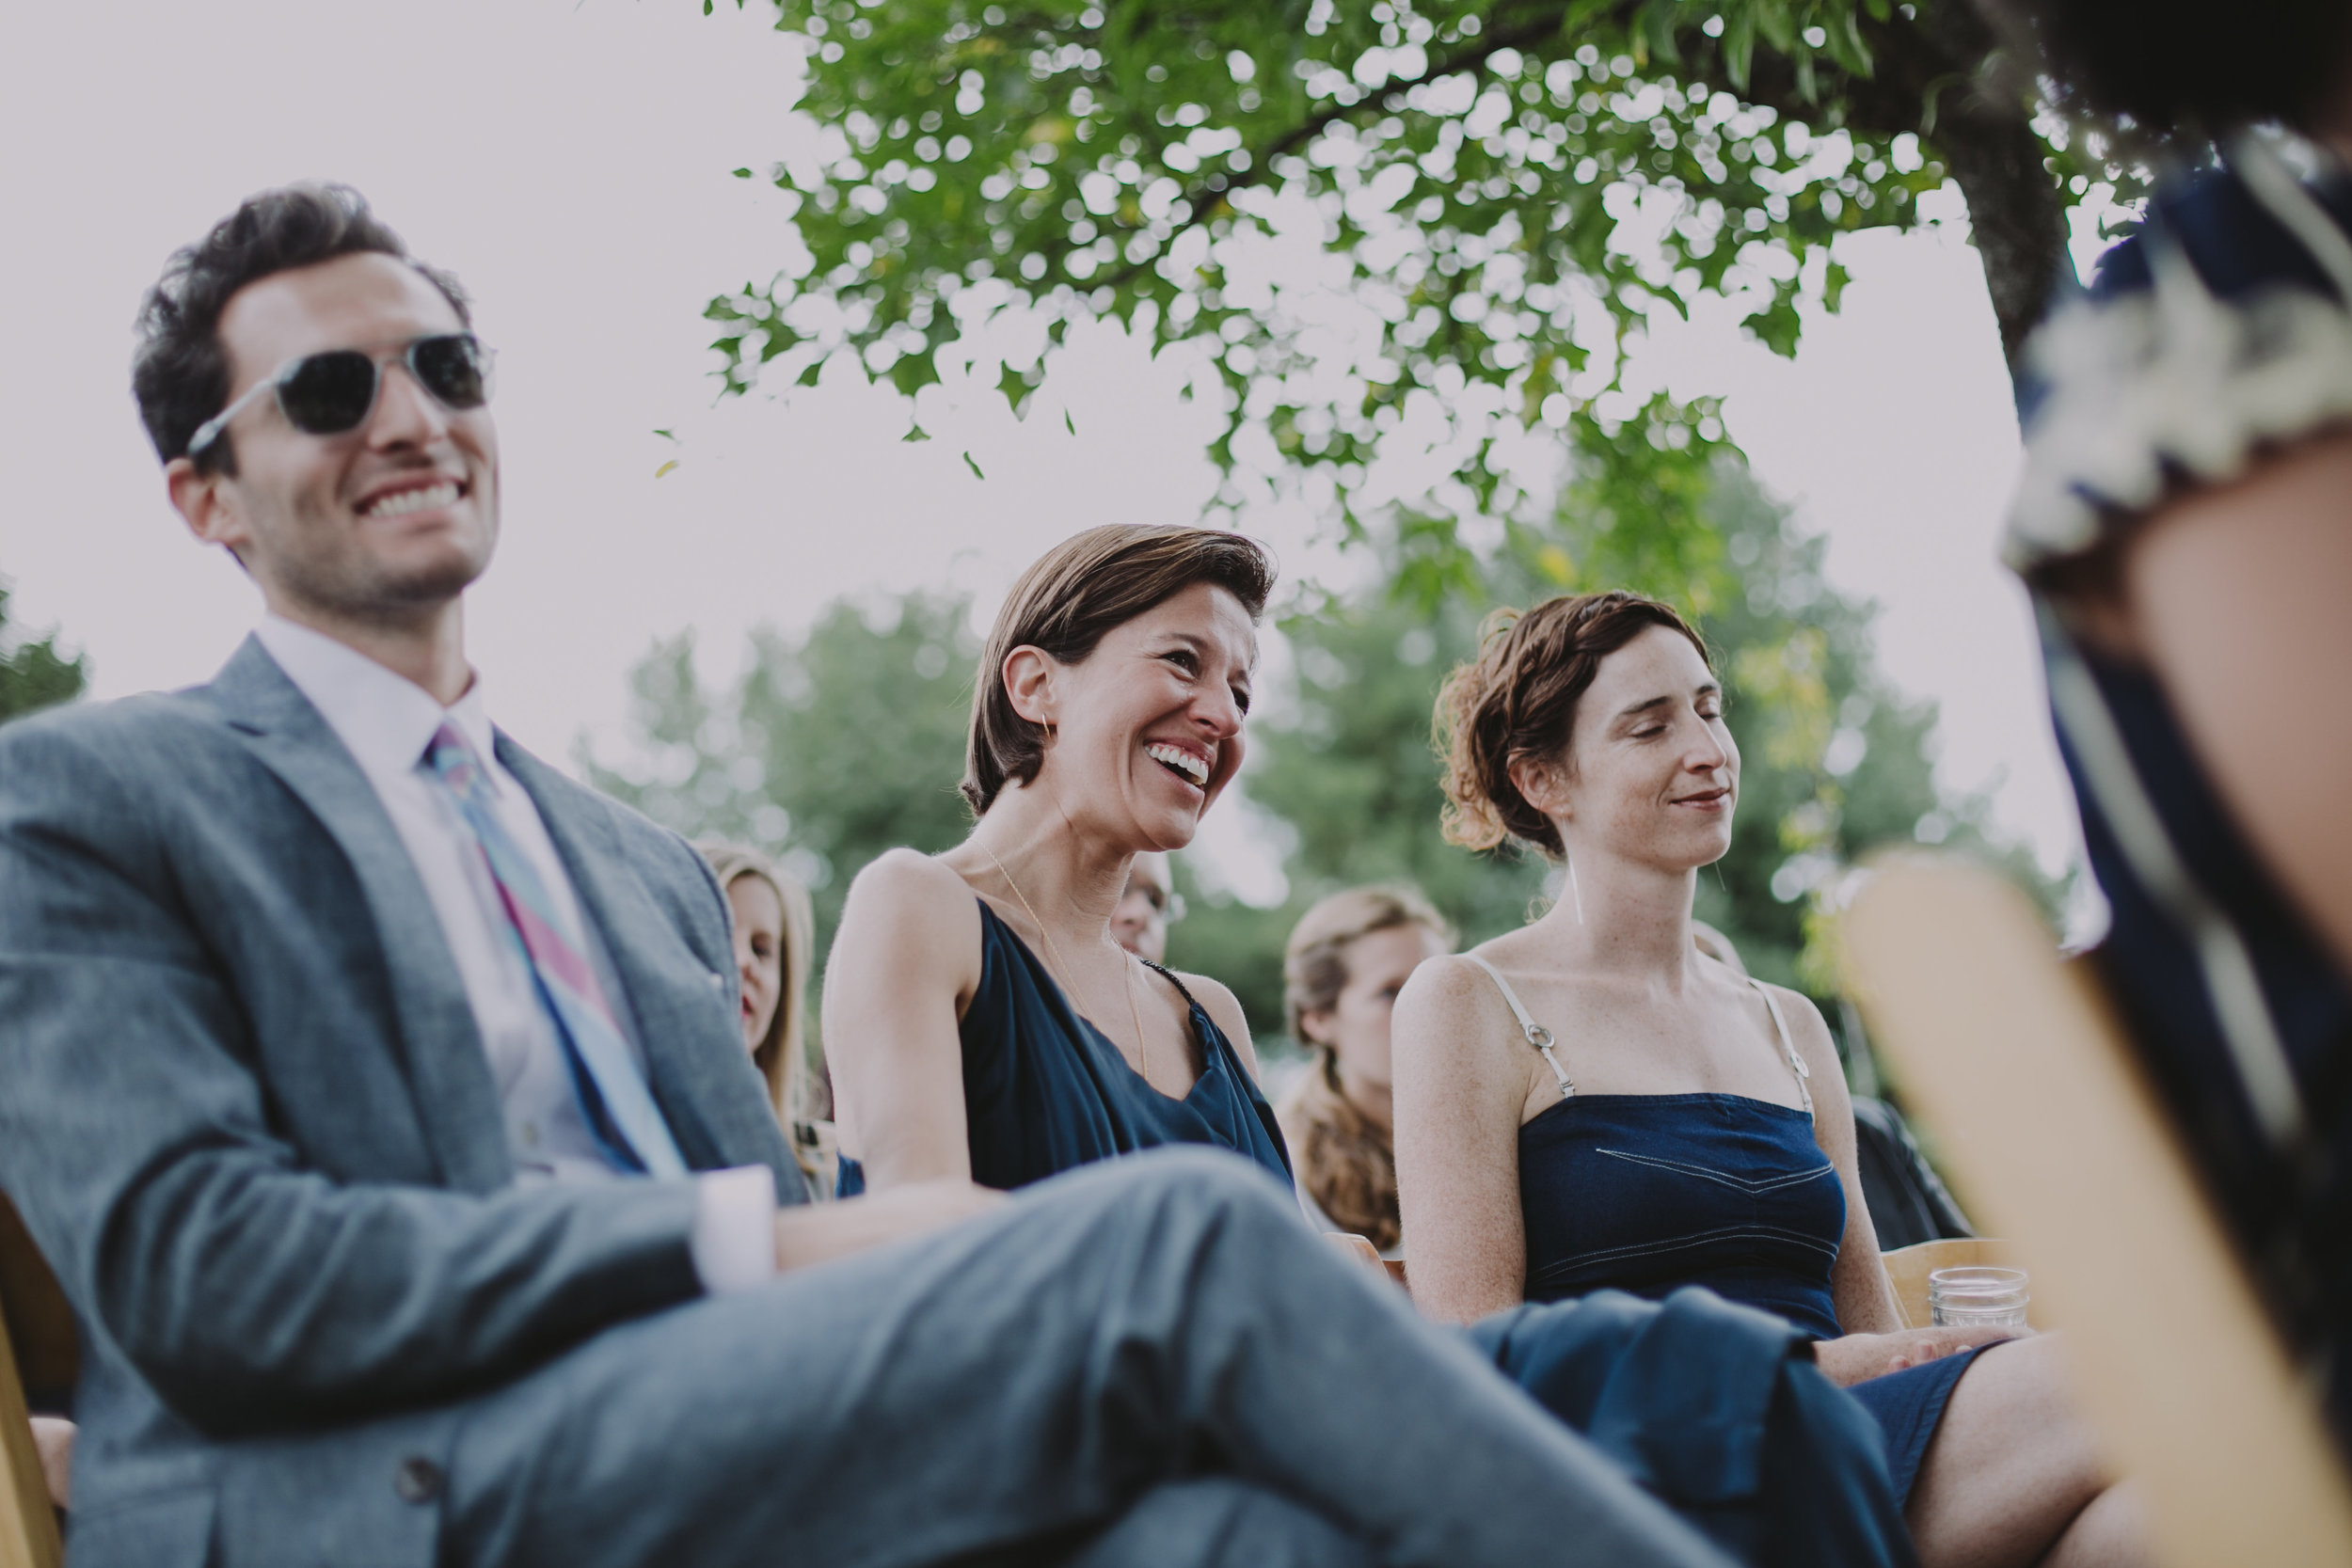 LIBERTY_VIEW_FARM_HIGHLAND_NY_WEDDING_CHELLISE_MICHAEL_PHOTOGRAPHY836.JPG